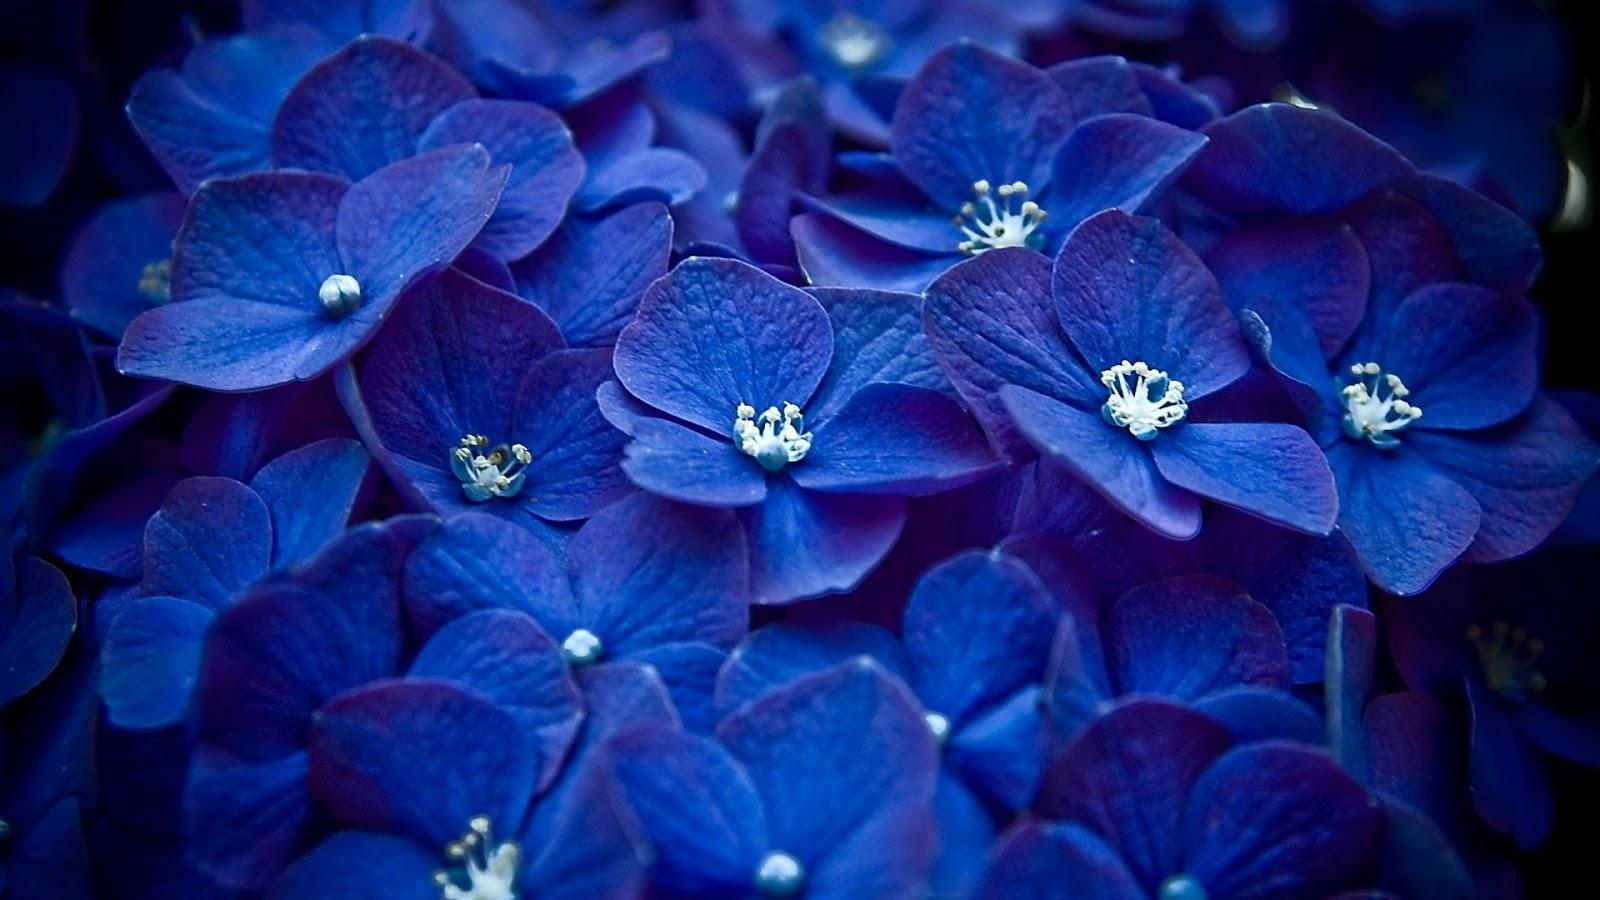 Pretty Flowers Tumblr Hd Gardening Flower And Vegetables